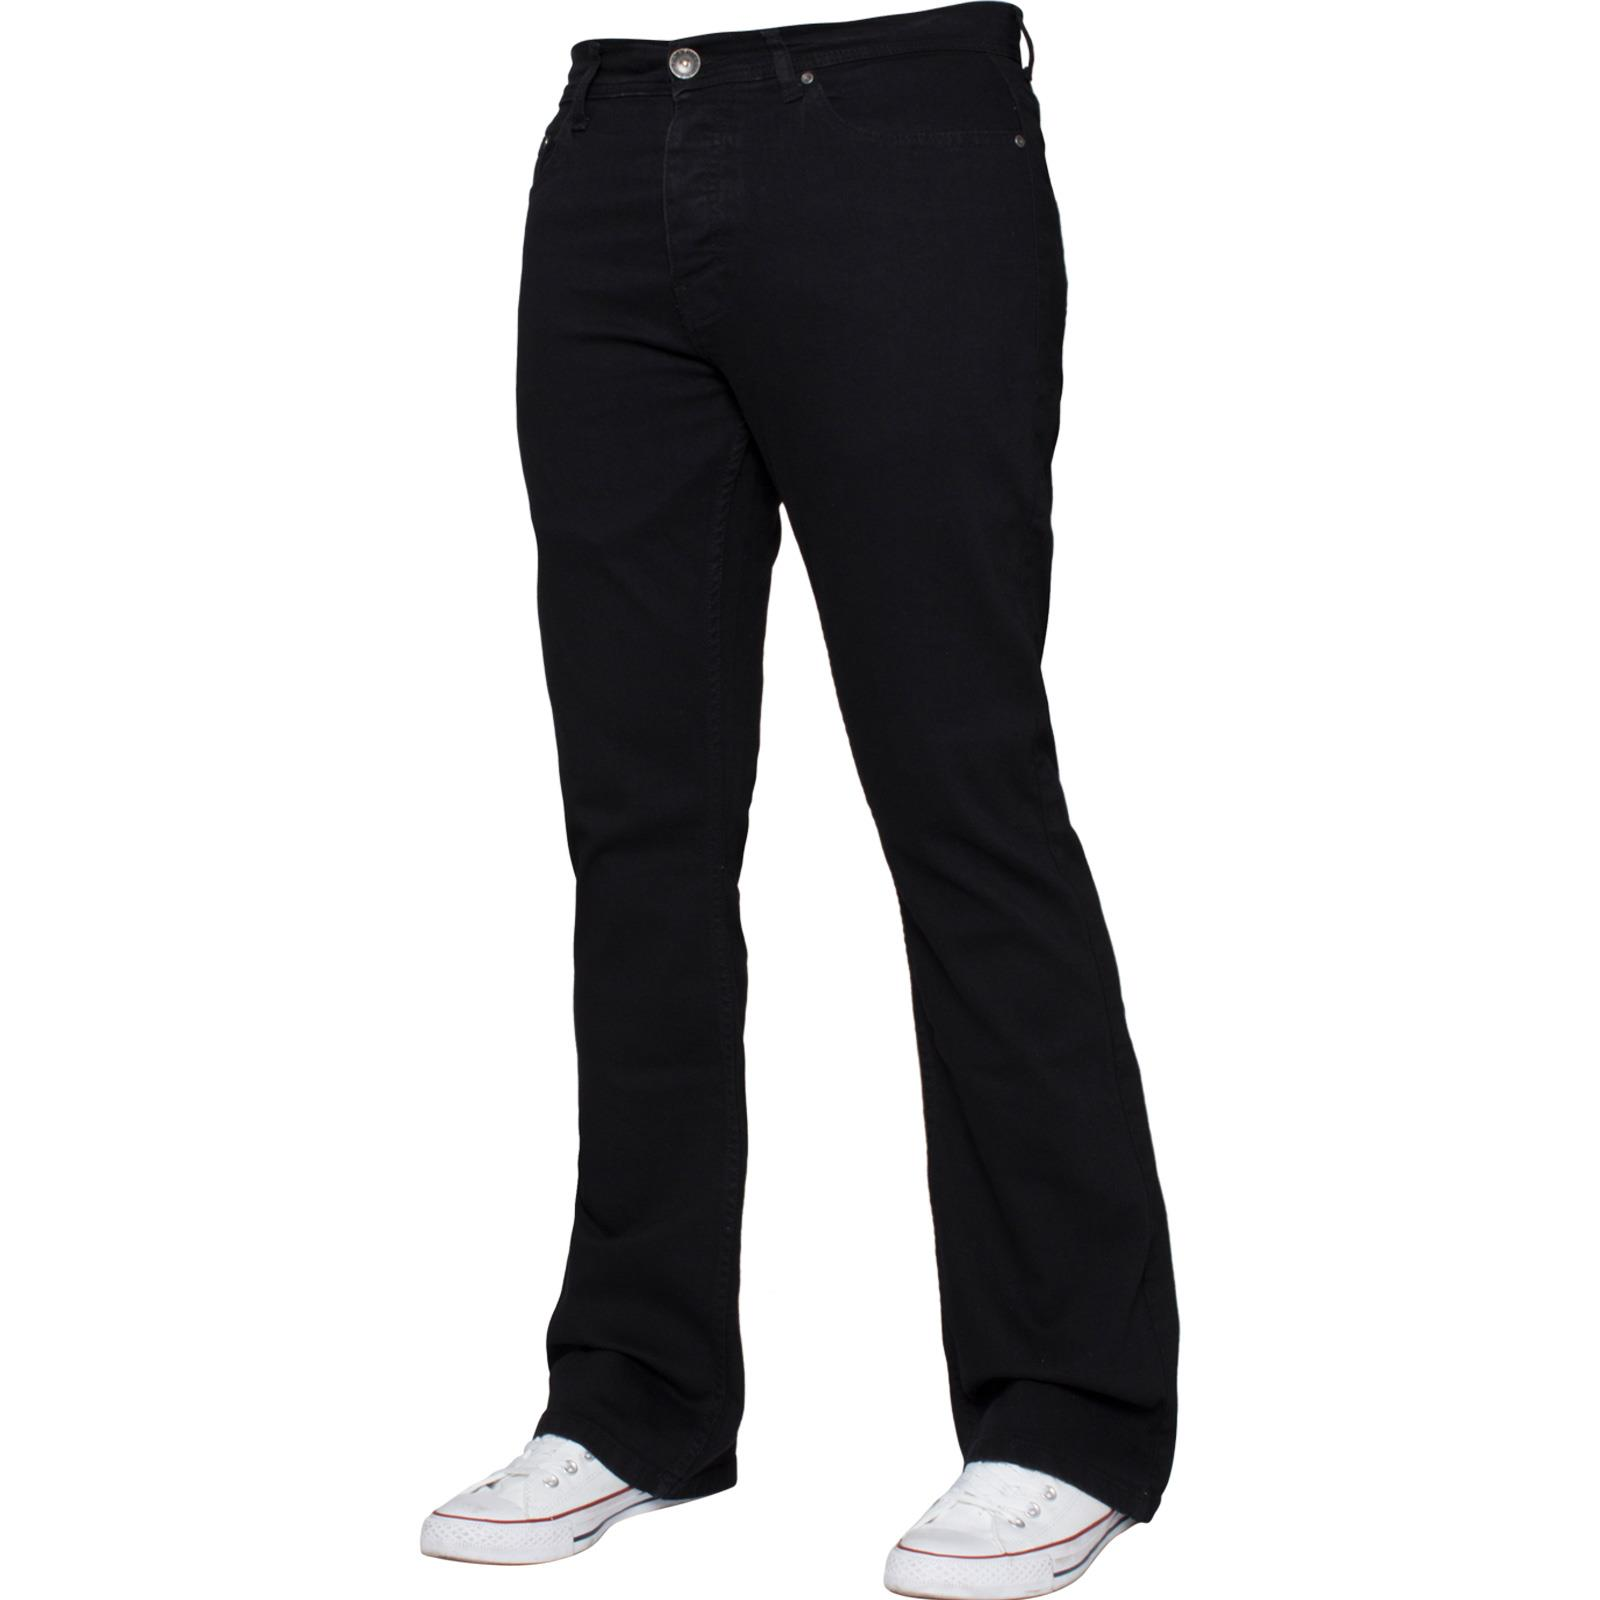 Para-Hombre-Pierna-Recta-Bootcut-Stretch-Denim-Regulares-Pantalon-de-trabajo-Kruze-Todas-Cinturas miniatura 61